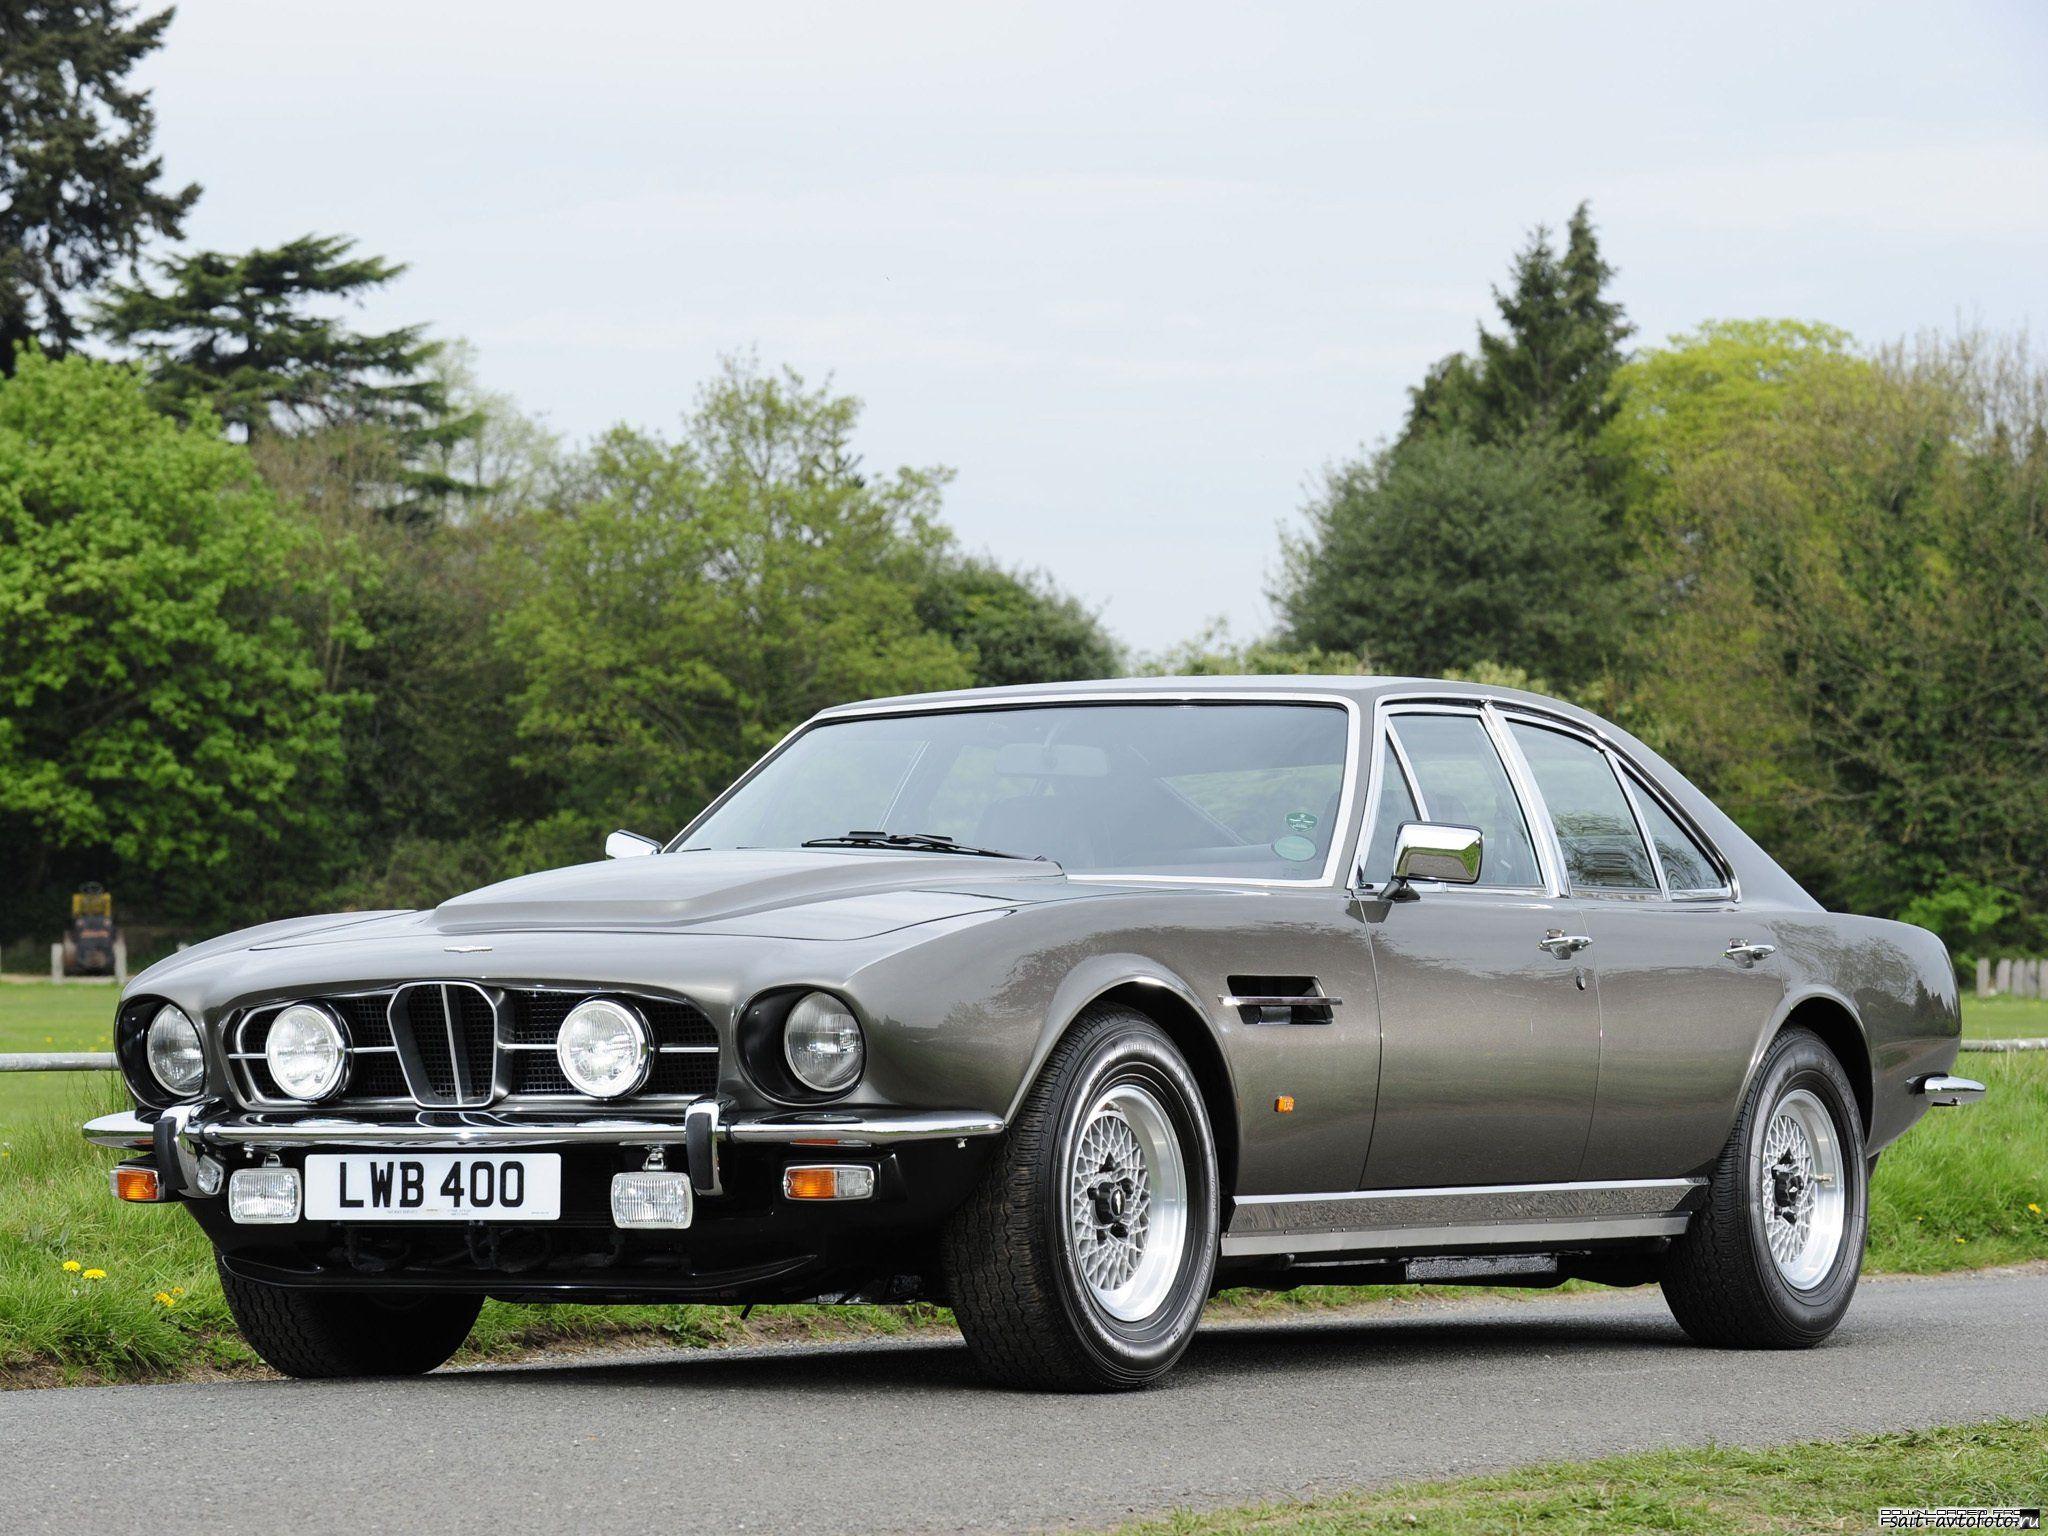 1974 1975 Aston Martin Lagonda Mki Aston Martin Lagonda Aston Martin Cars Classic Aston Martin